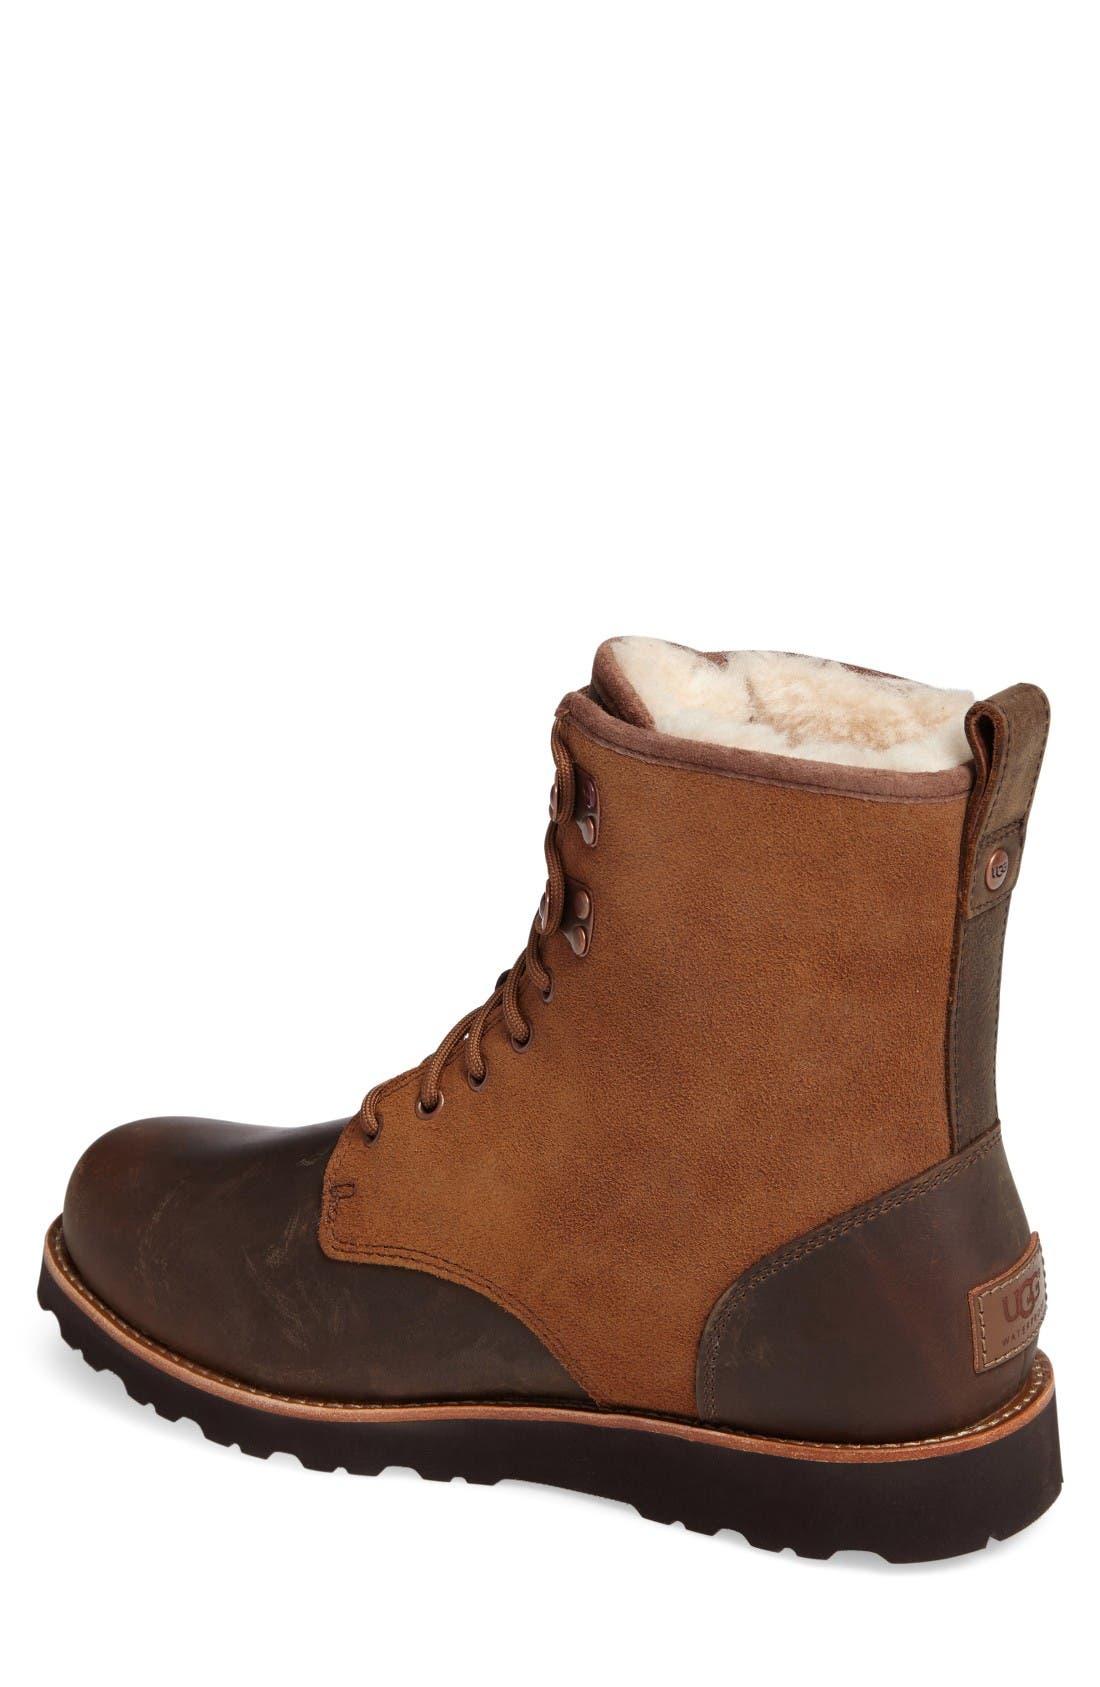 Alternate Image 2  - UGG® Hannen Plain Toe Waterproof Boot with Genuine Shearling (Men)